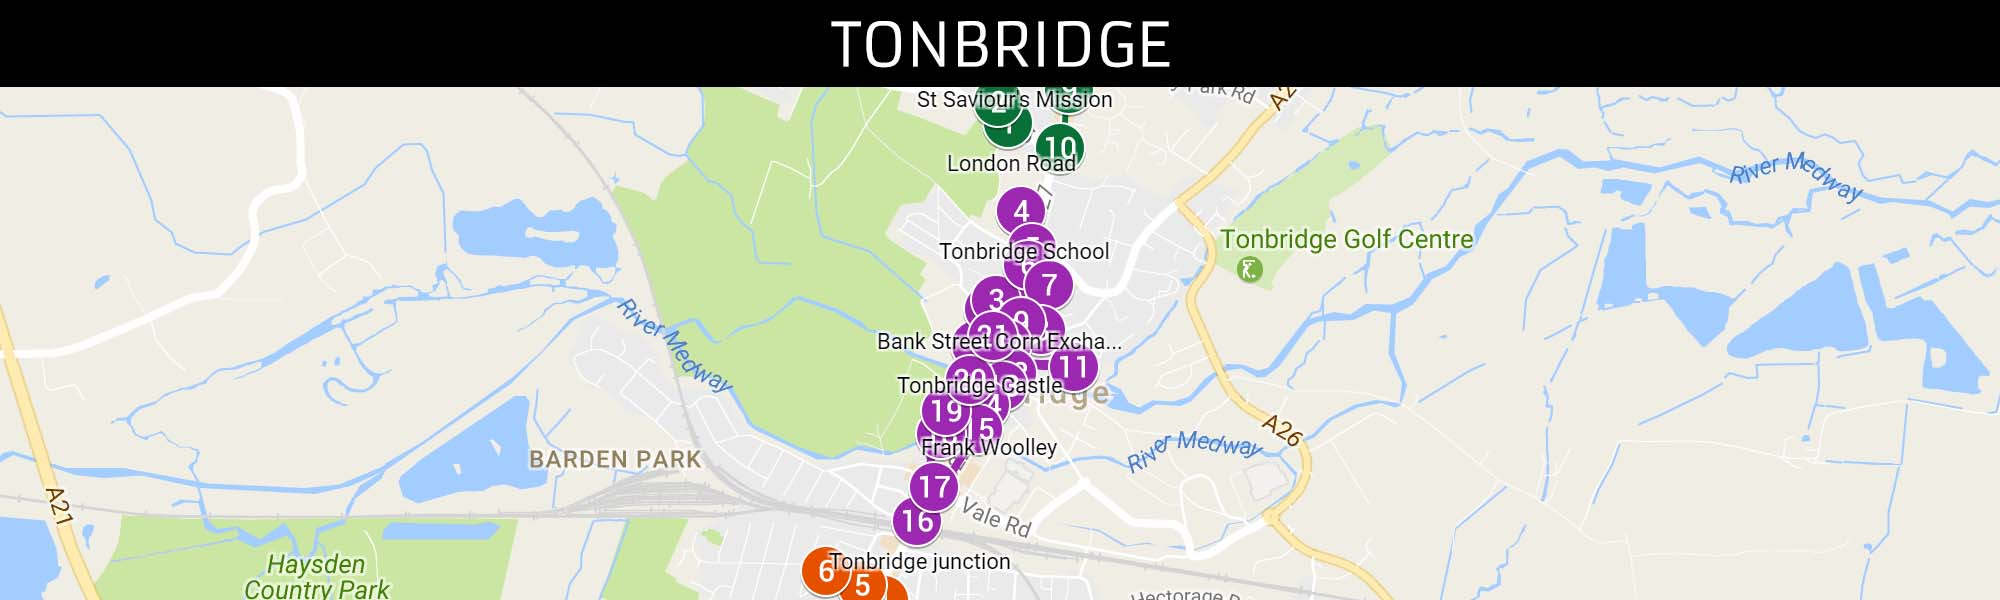 Tonbridge Trail